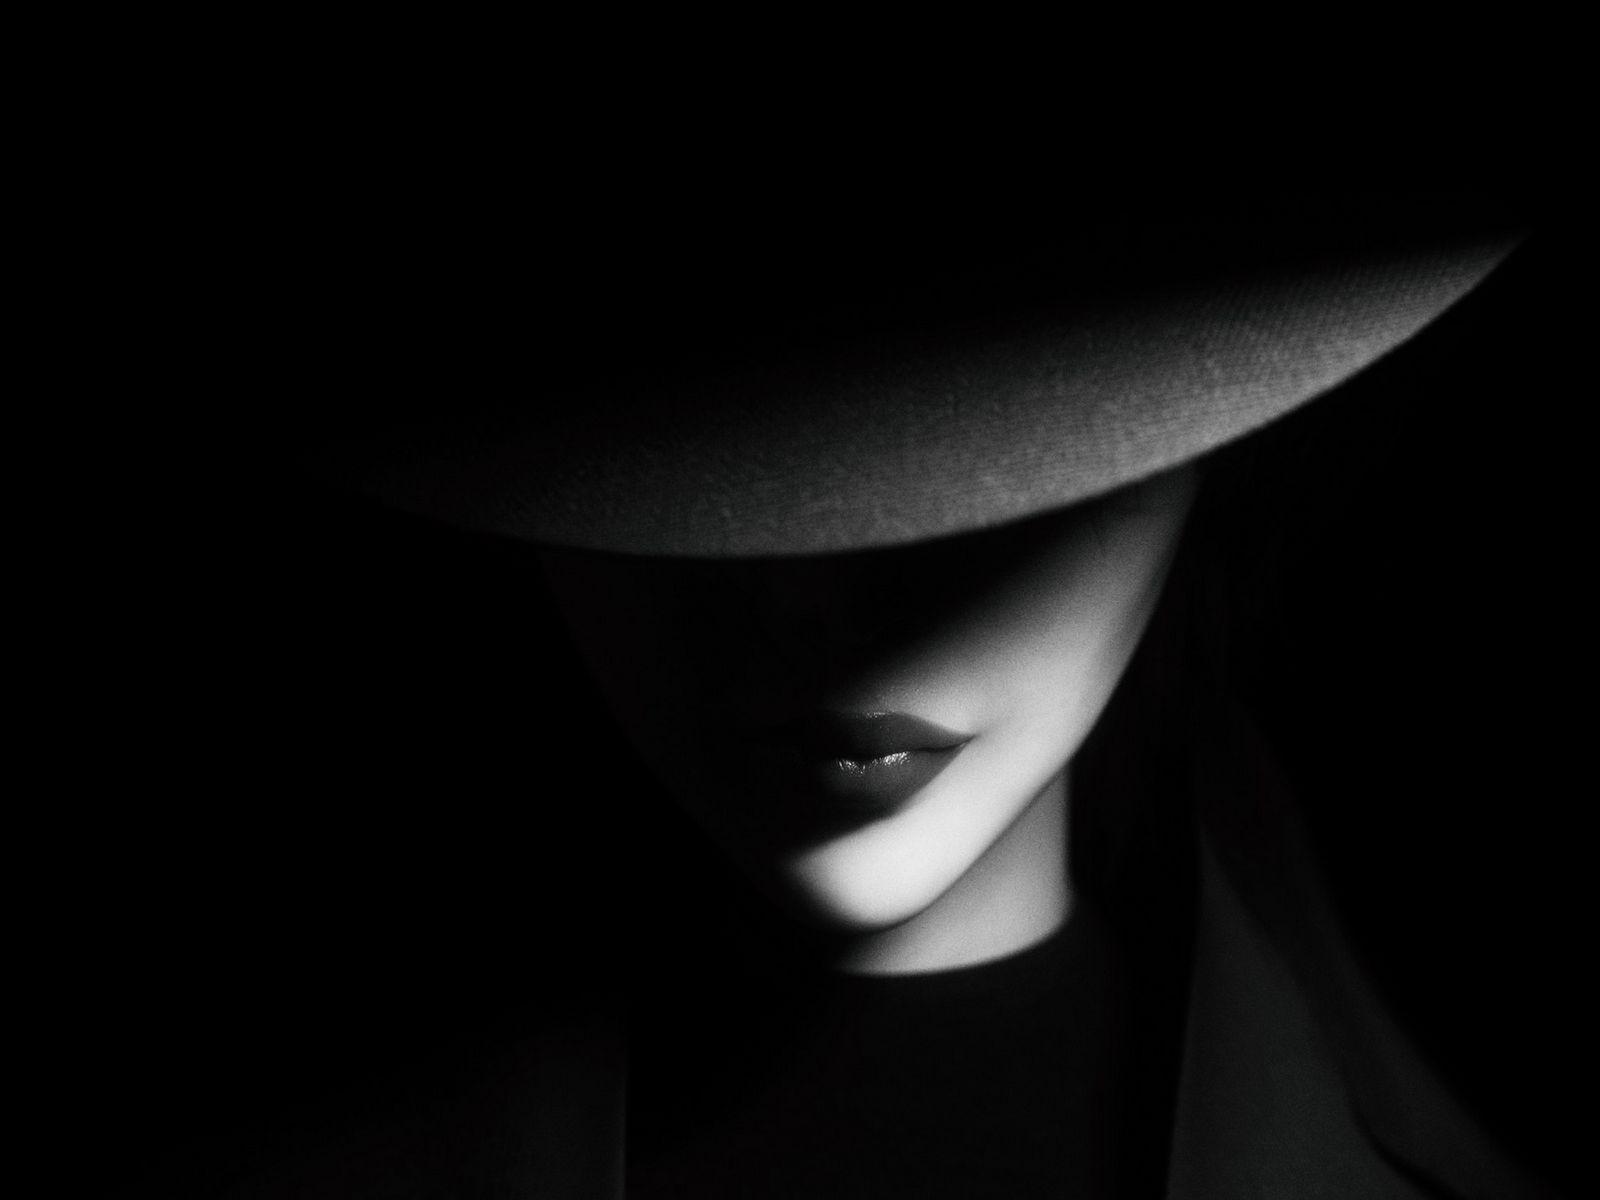 1600x1200 Wallpaper girl, hat, bw, dark, shadows